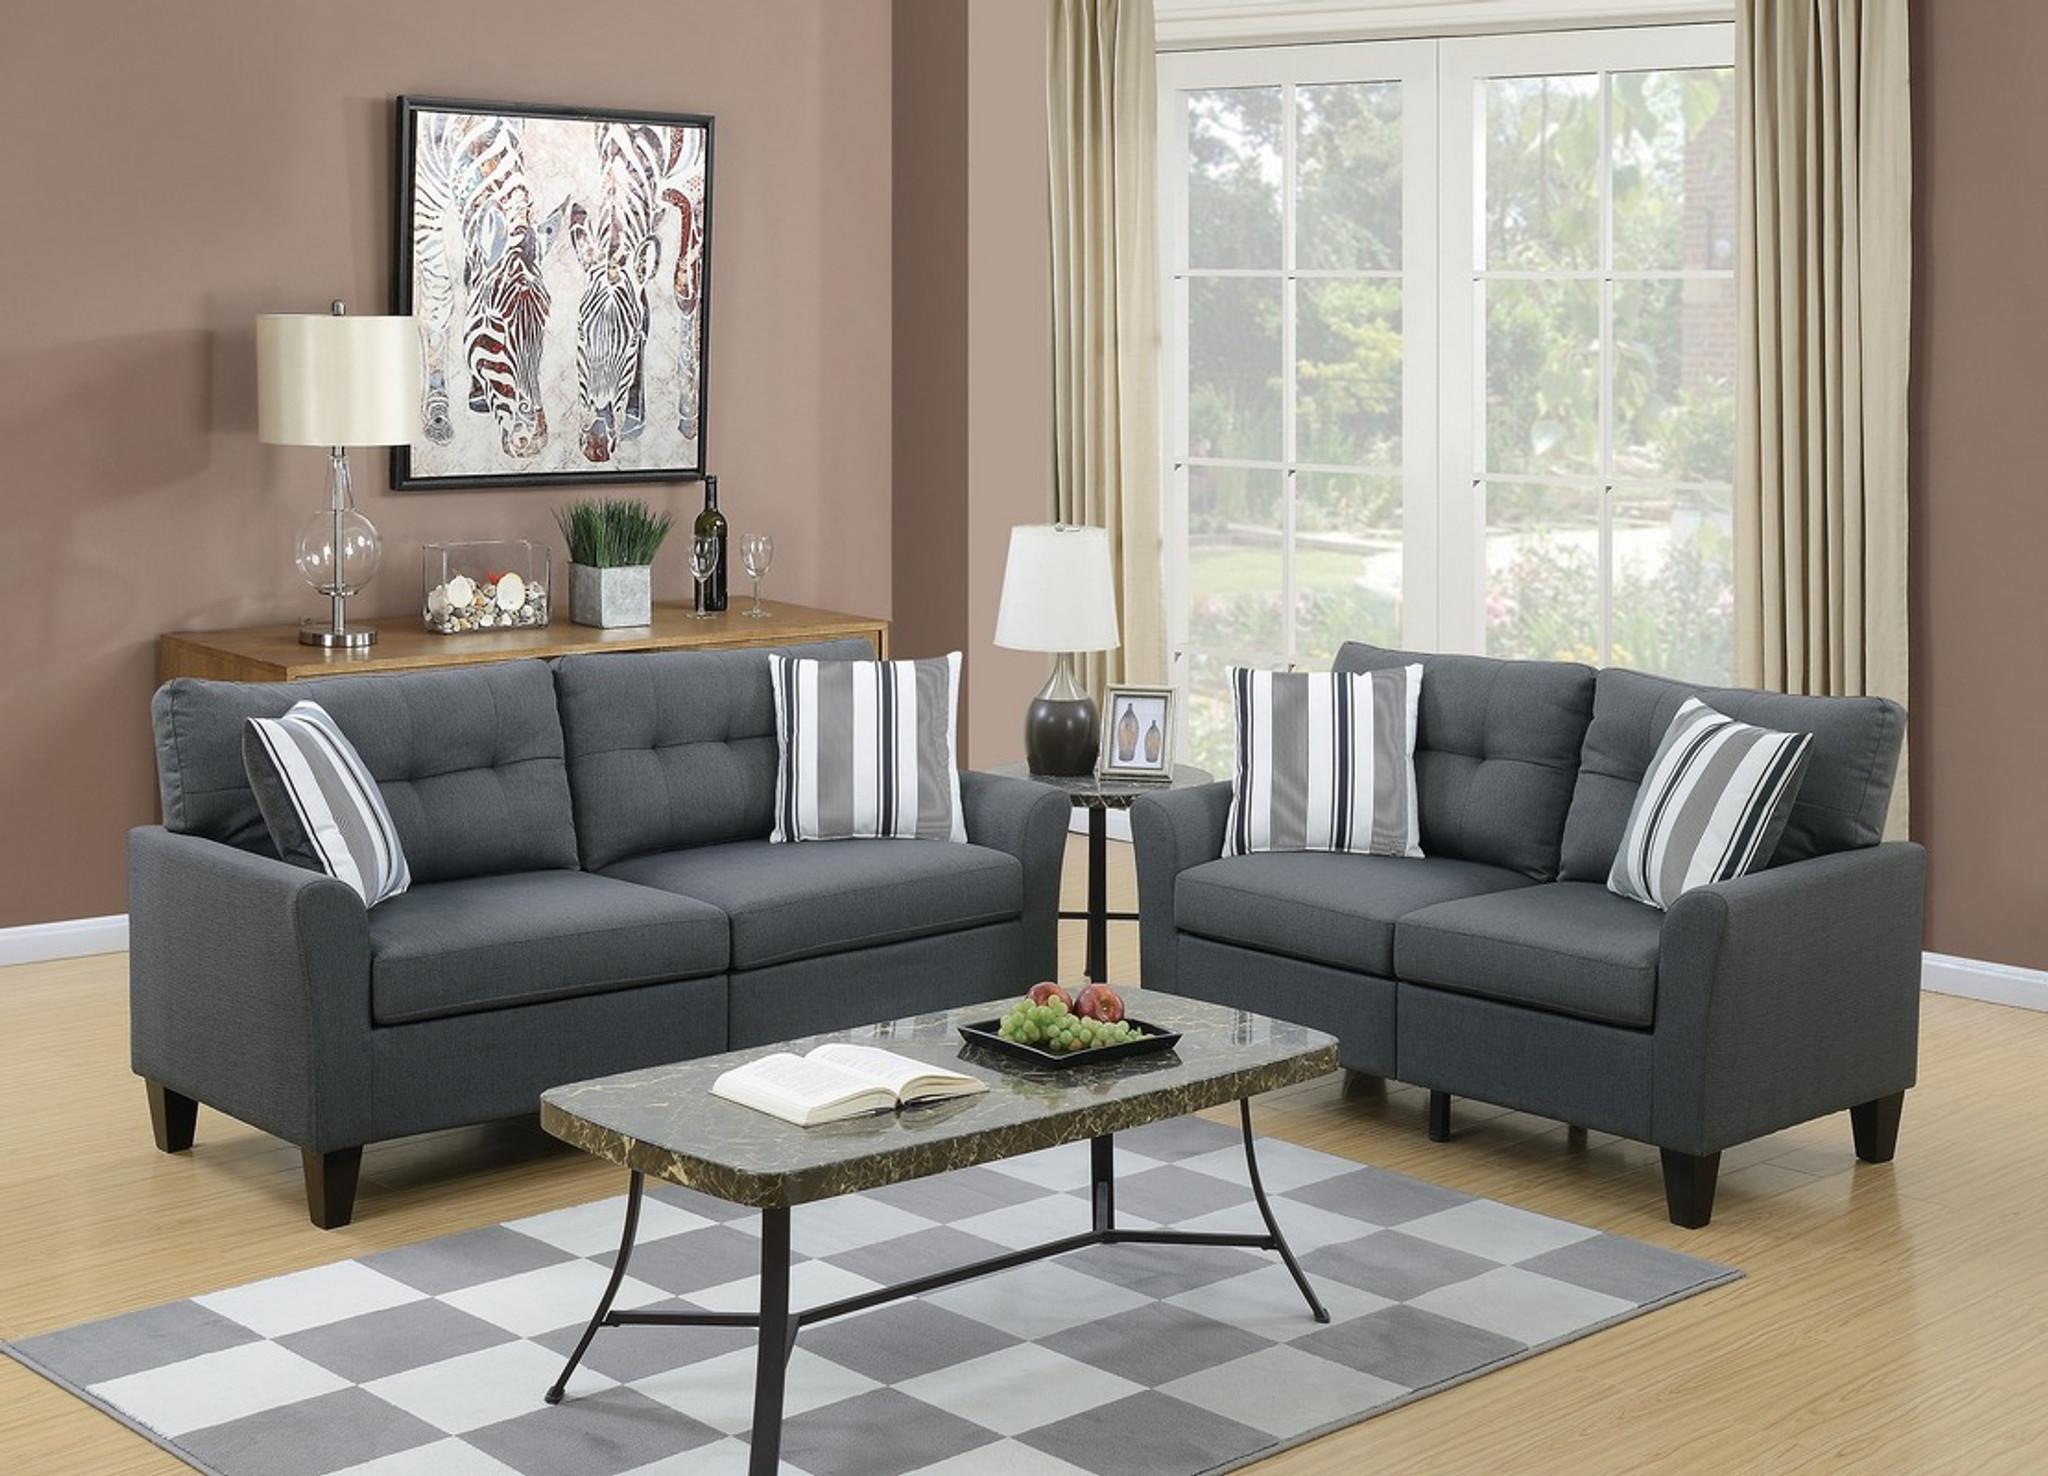 Outstanding 2Pcs Charcoal Color Sofa Set Creativecarmelina Interior Chair Design Creativecarmelinacom